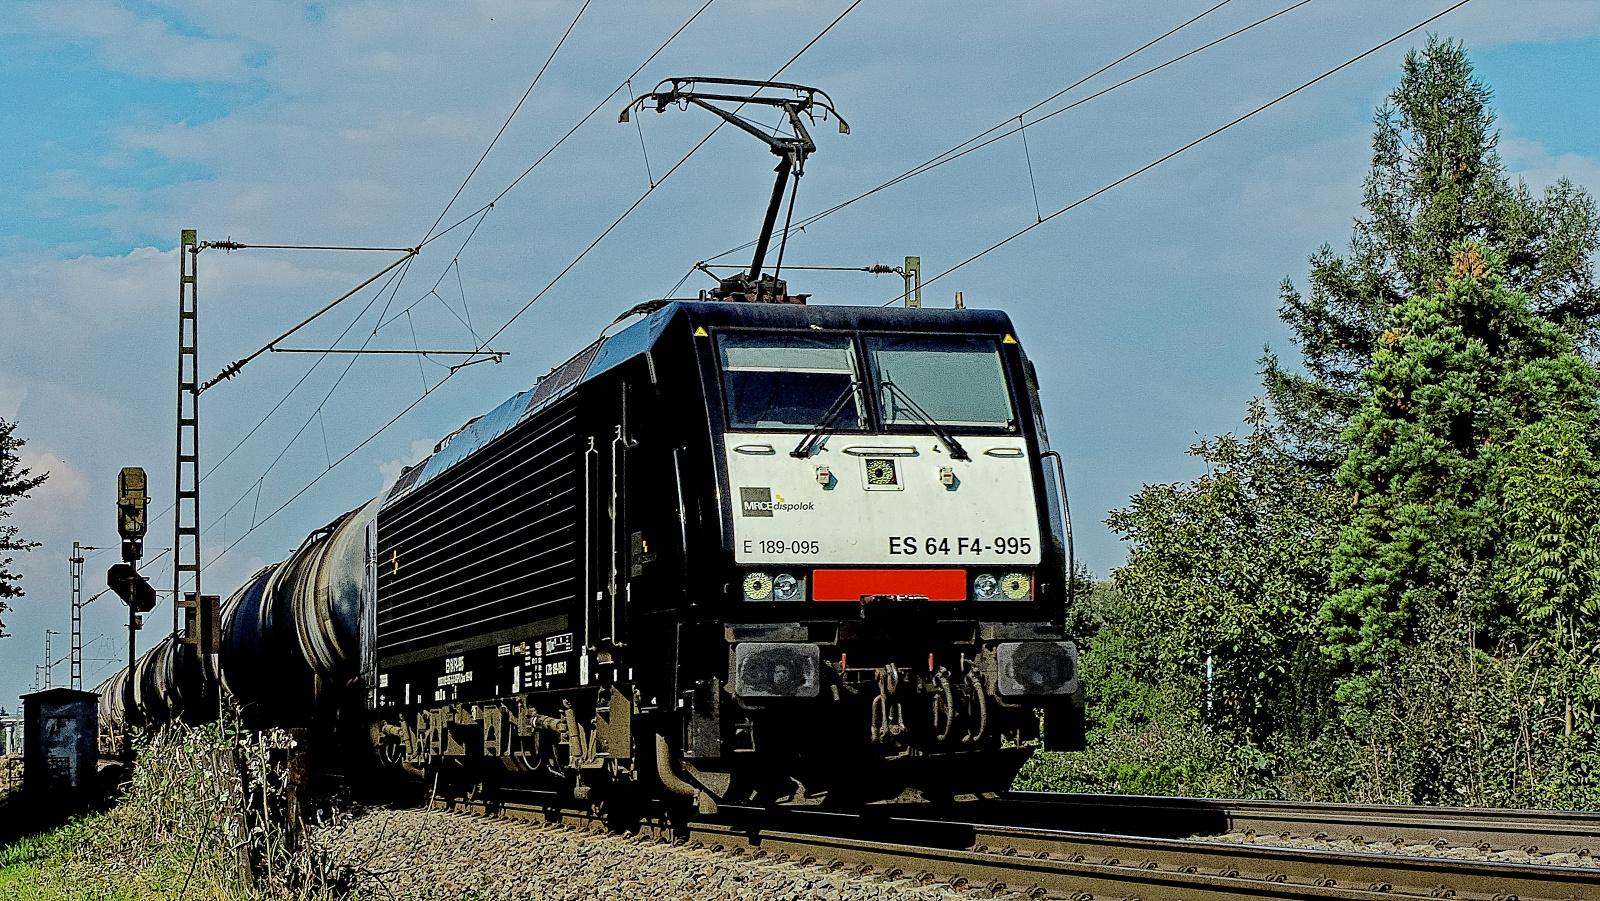 189 095 ES 64 F4-995 MRCE dispolok mit einem Kesselzug